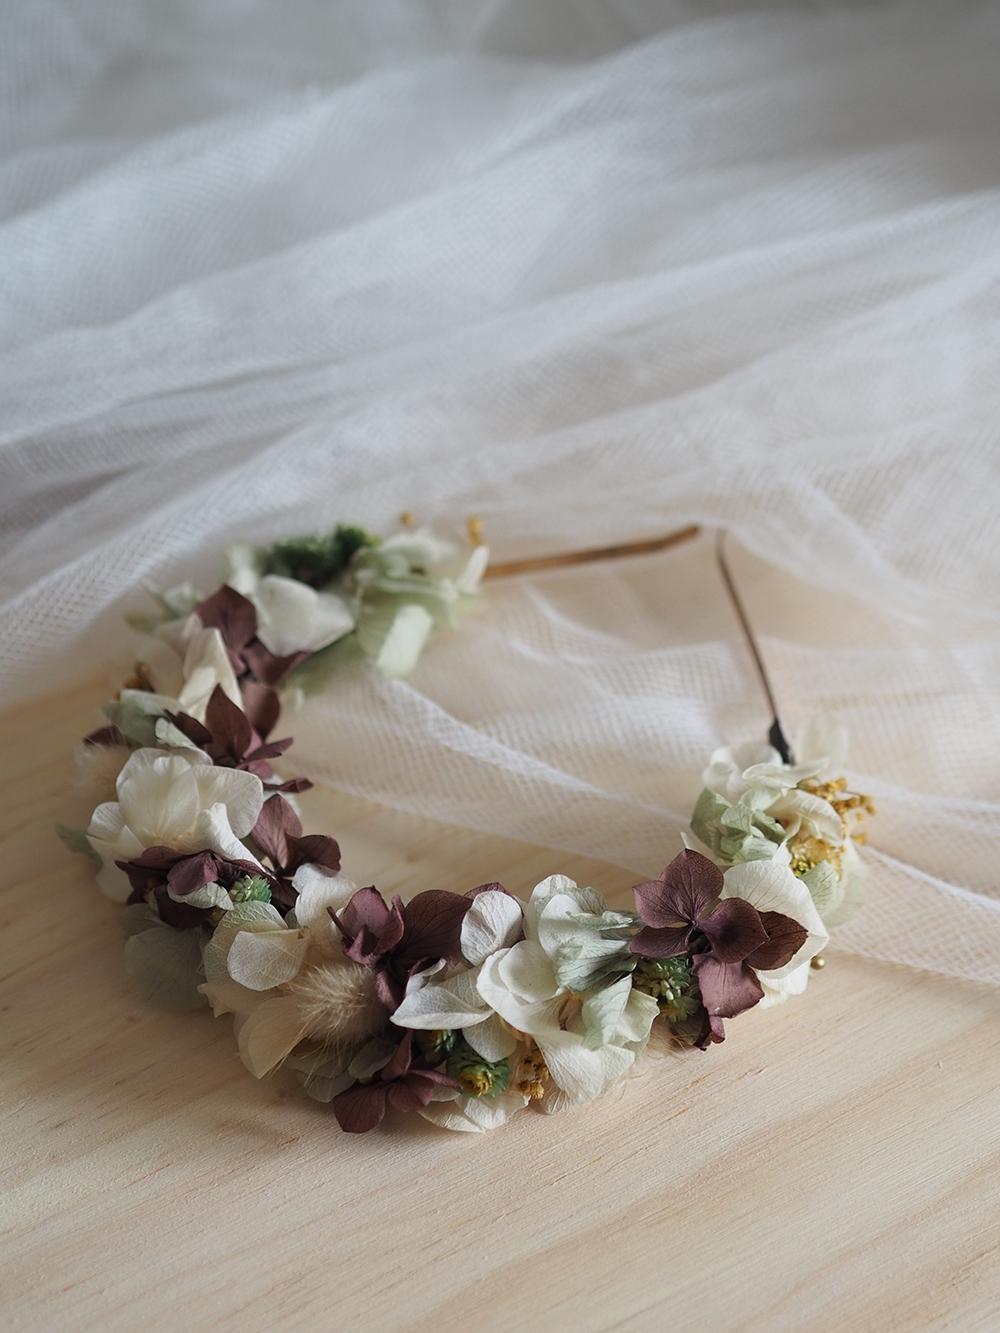 Coronas de flores para decorar + Sorteo_24